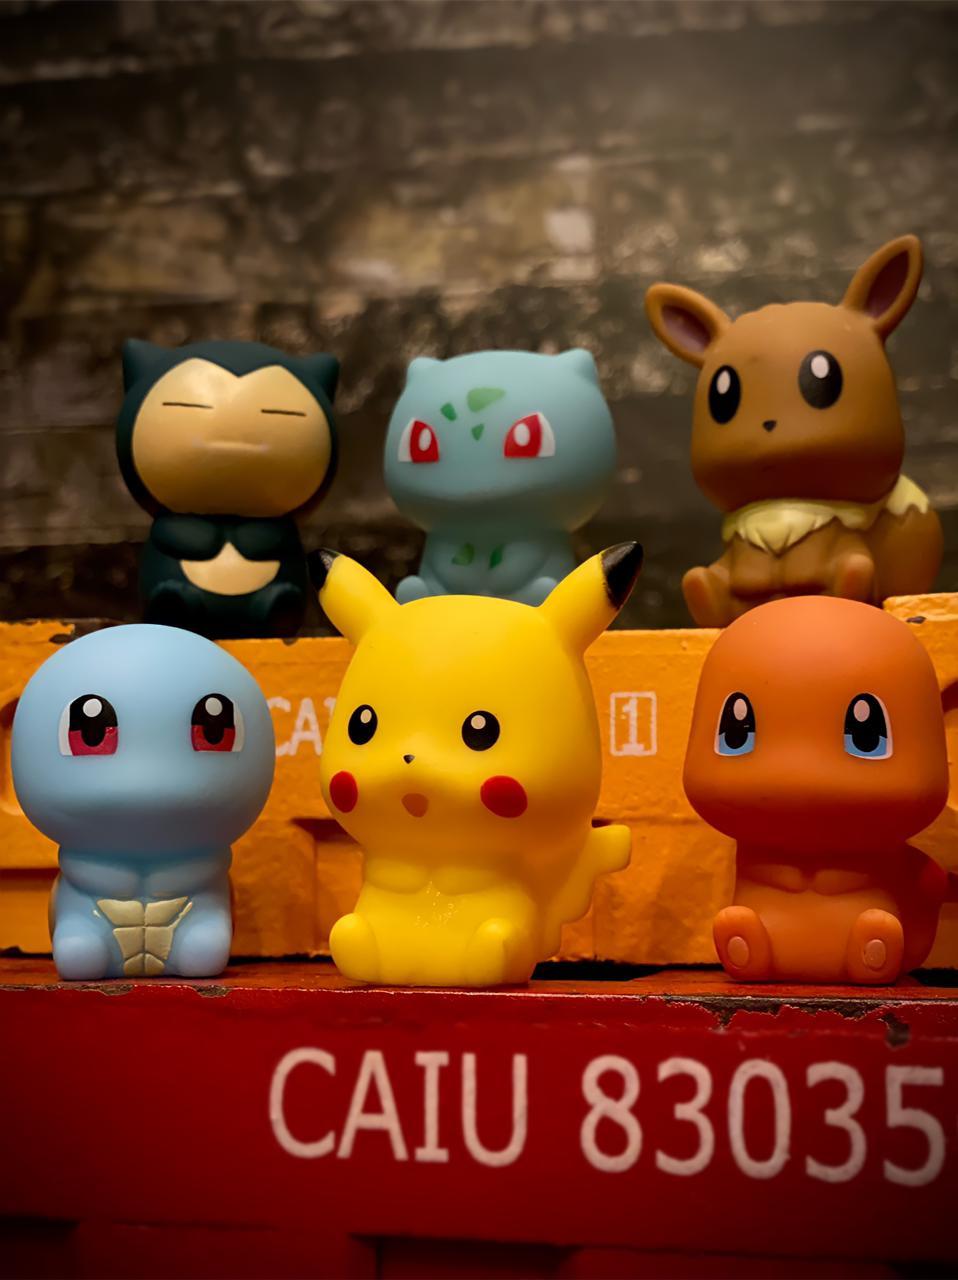 Kit Pokémon 6 Personagens  de Vinil: Pikachu, Snorlax, Charmander, Squirtle, Eevee e Bulbasaur - Brinquedo Colecionável Anime Mangá